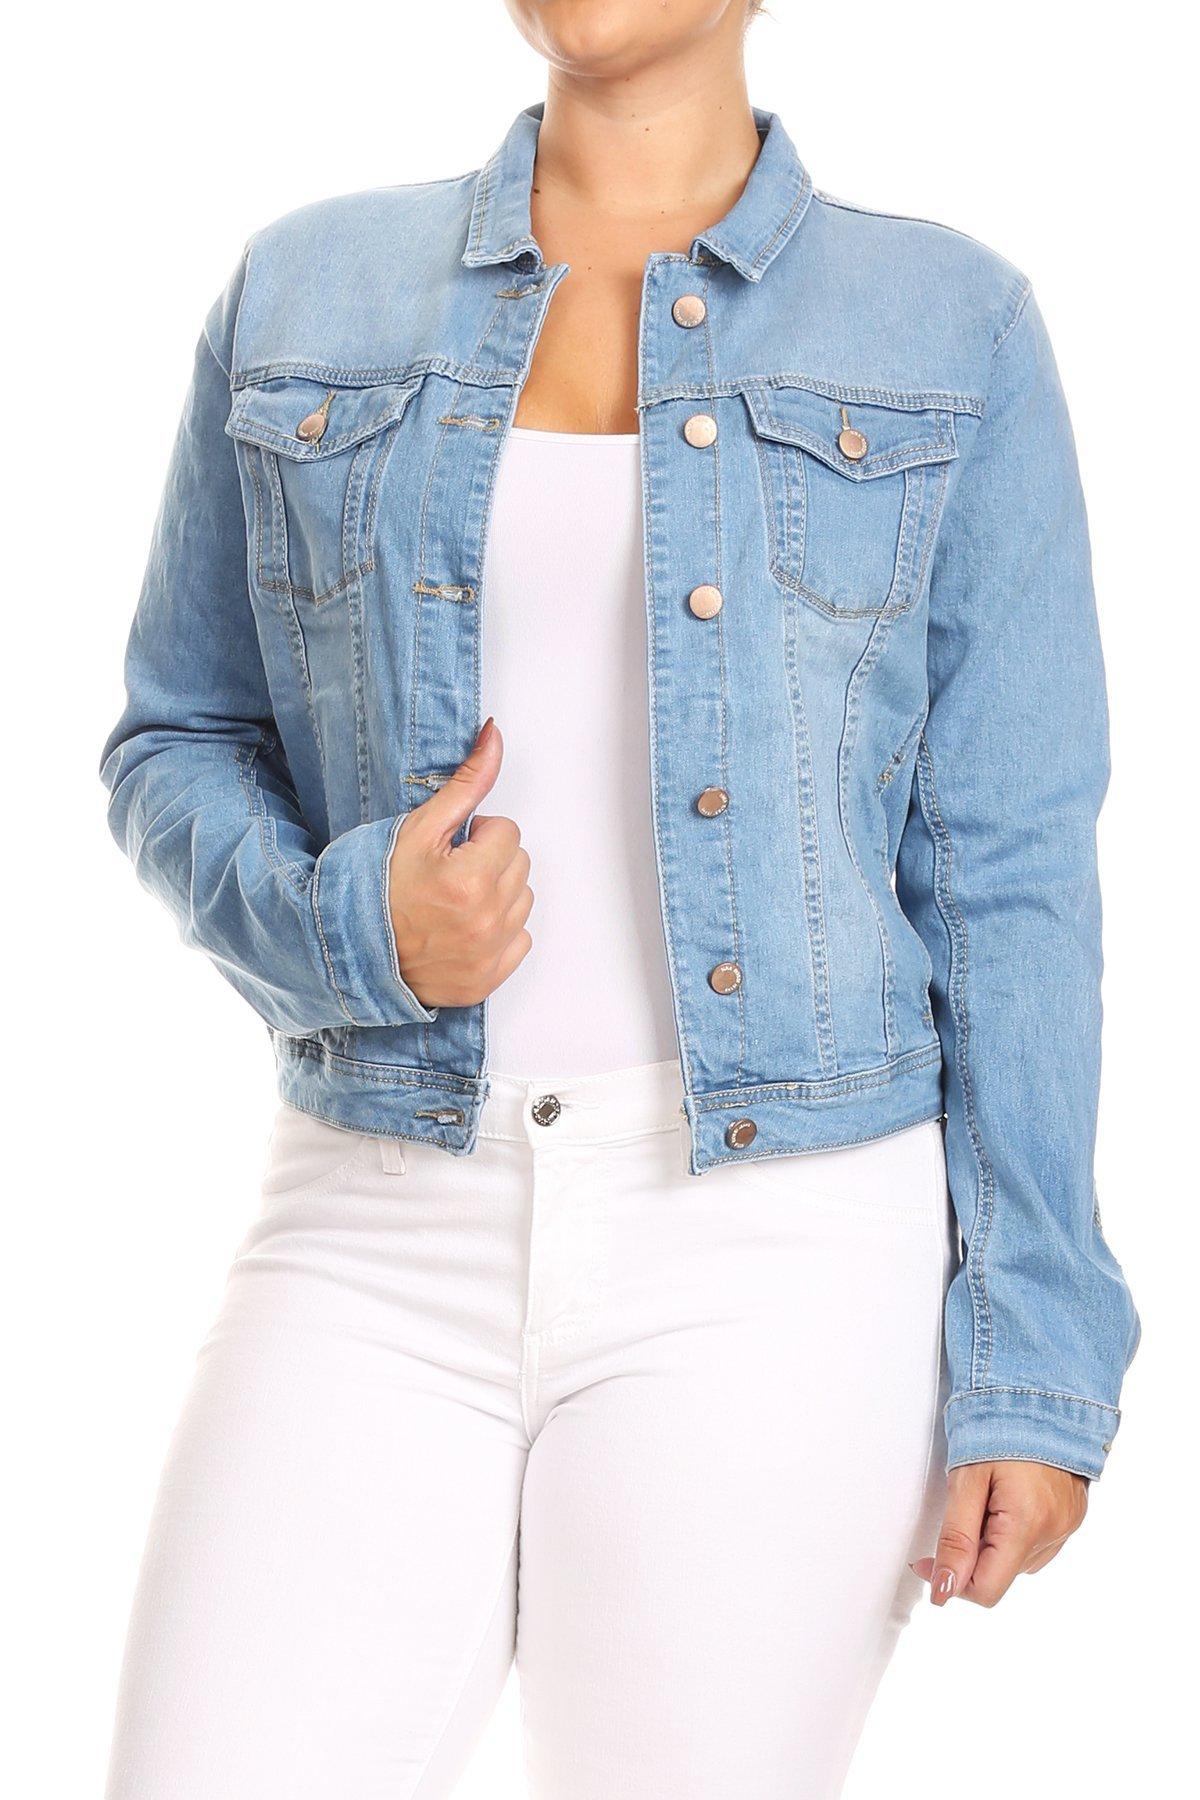 Women's Premium Denim Jackets Long Sleeve Jean Coats in Light Blue Size XL